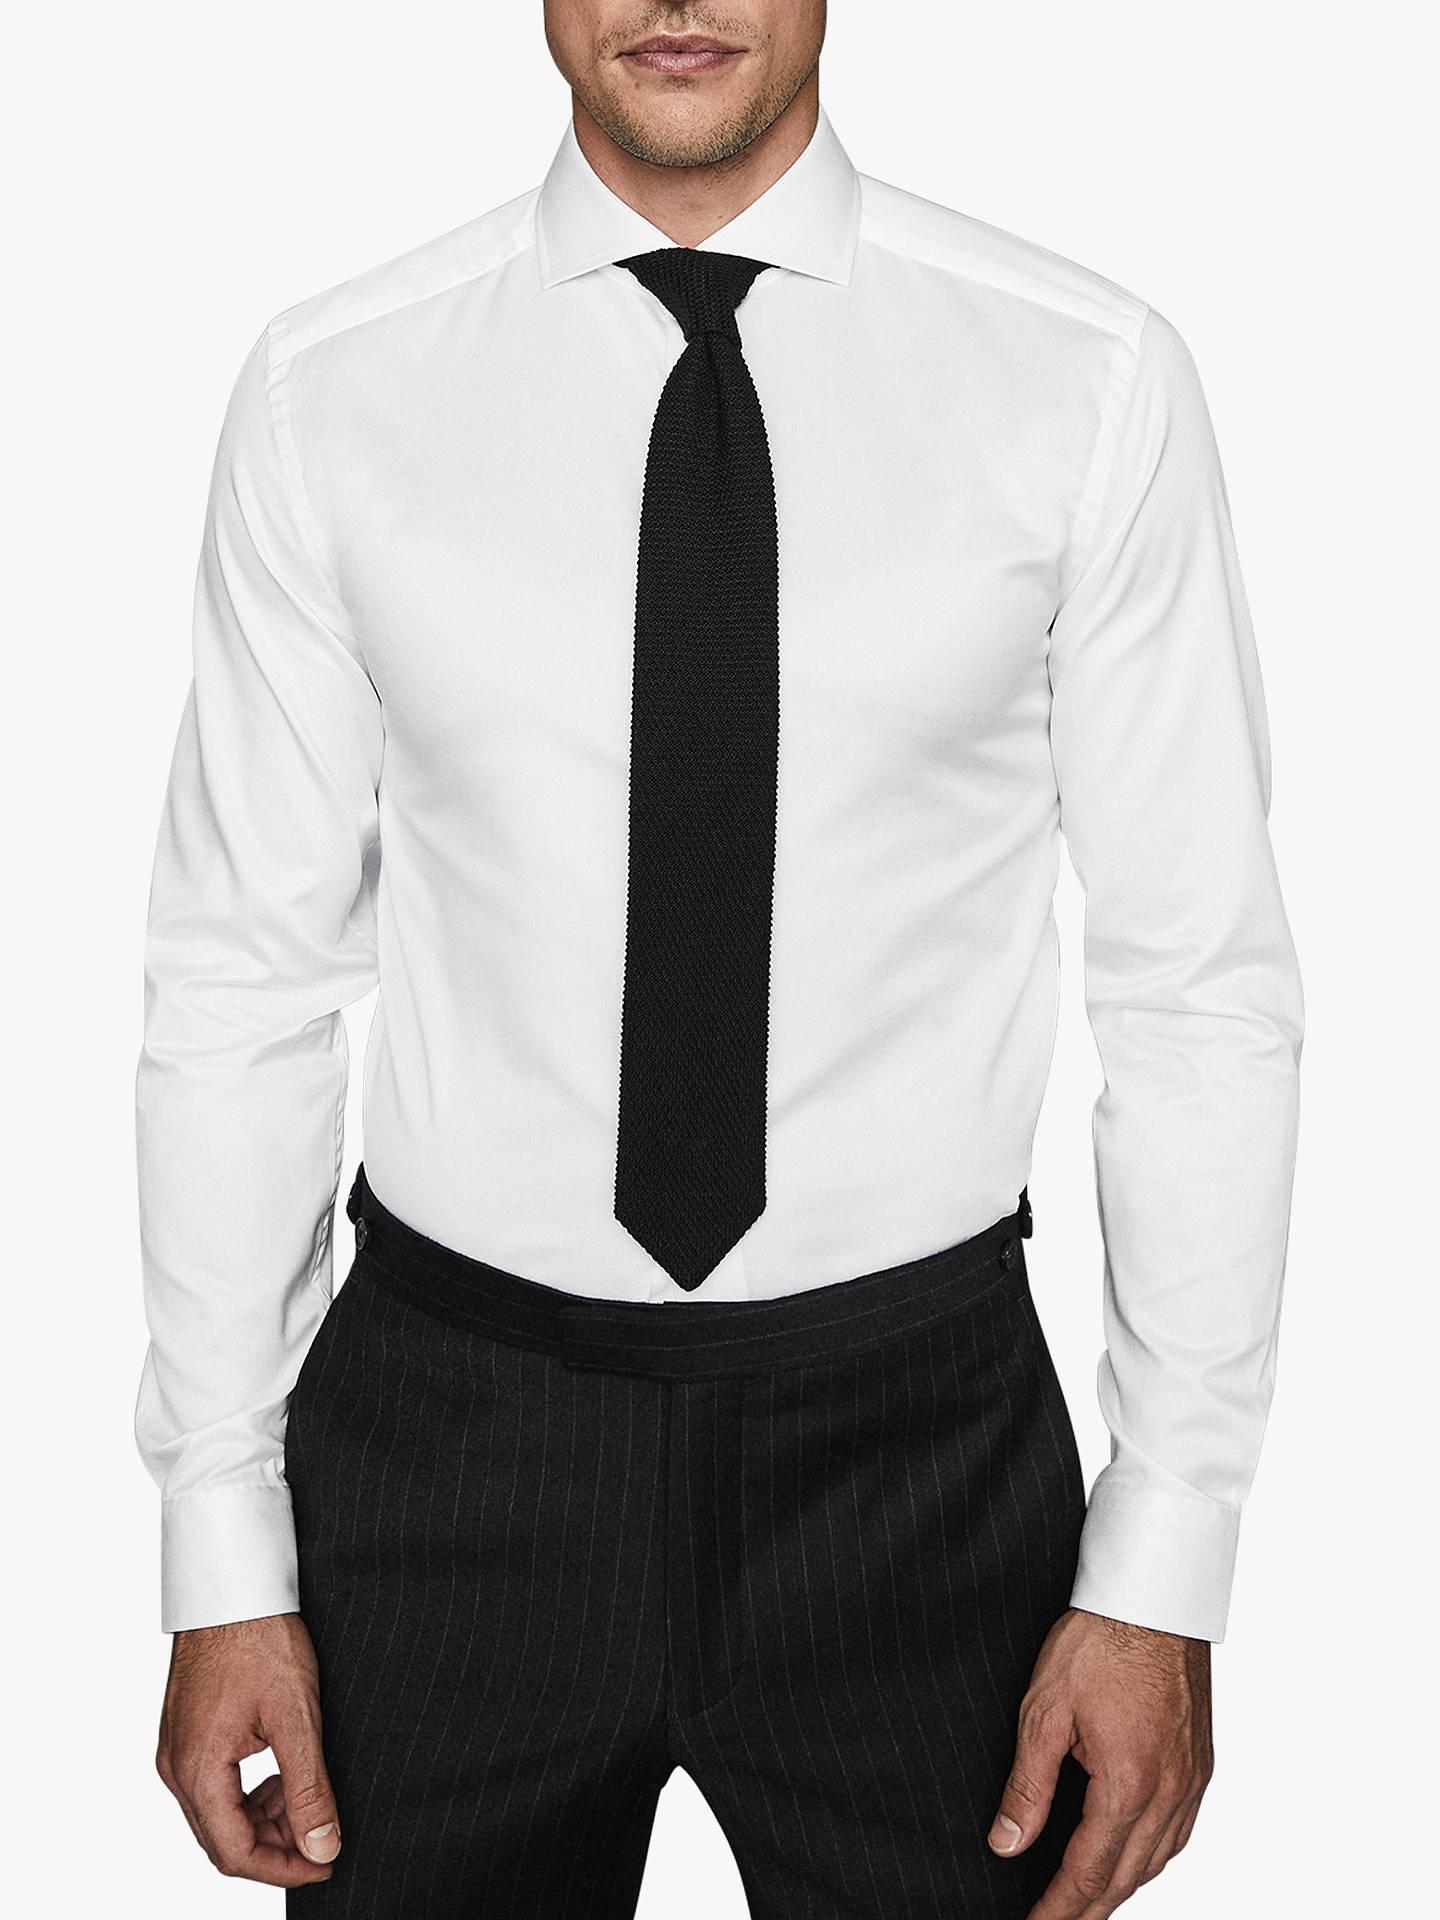 Reiss Storm Cutaway Collar Slim Fit Shirt At John Lewis Partners